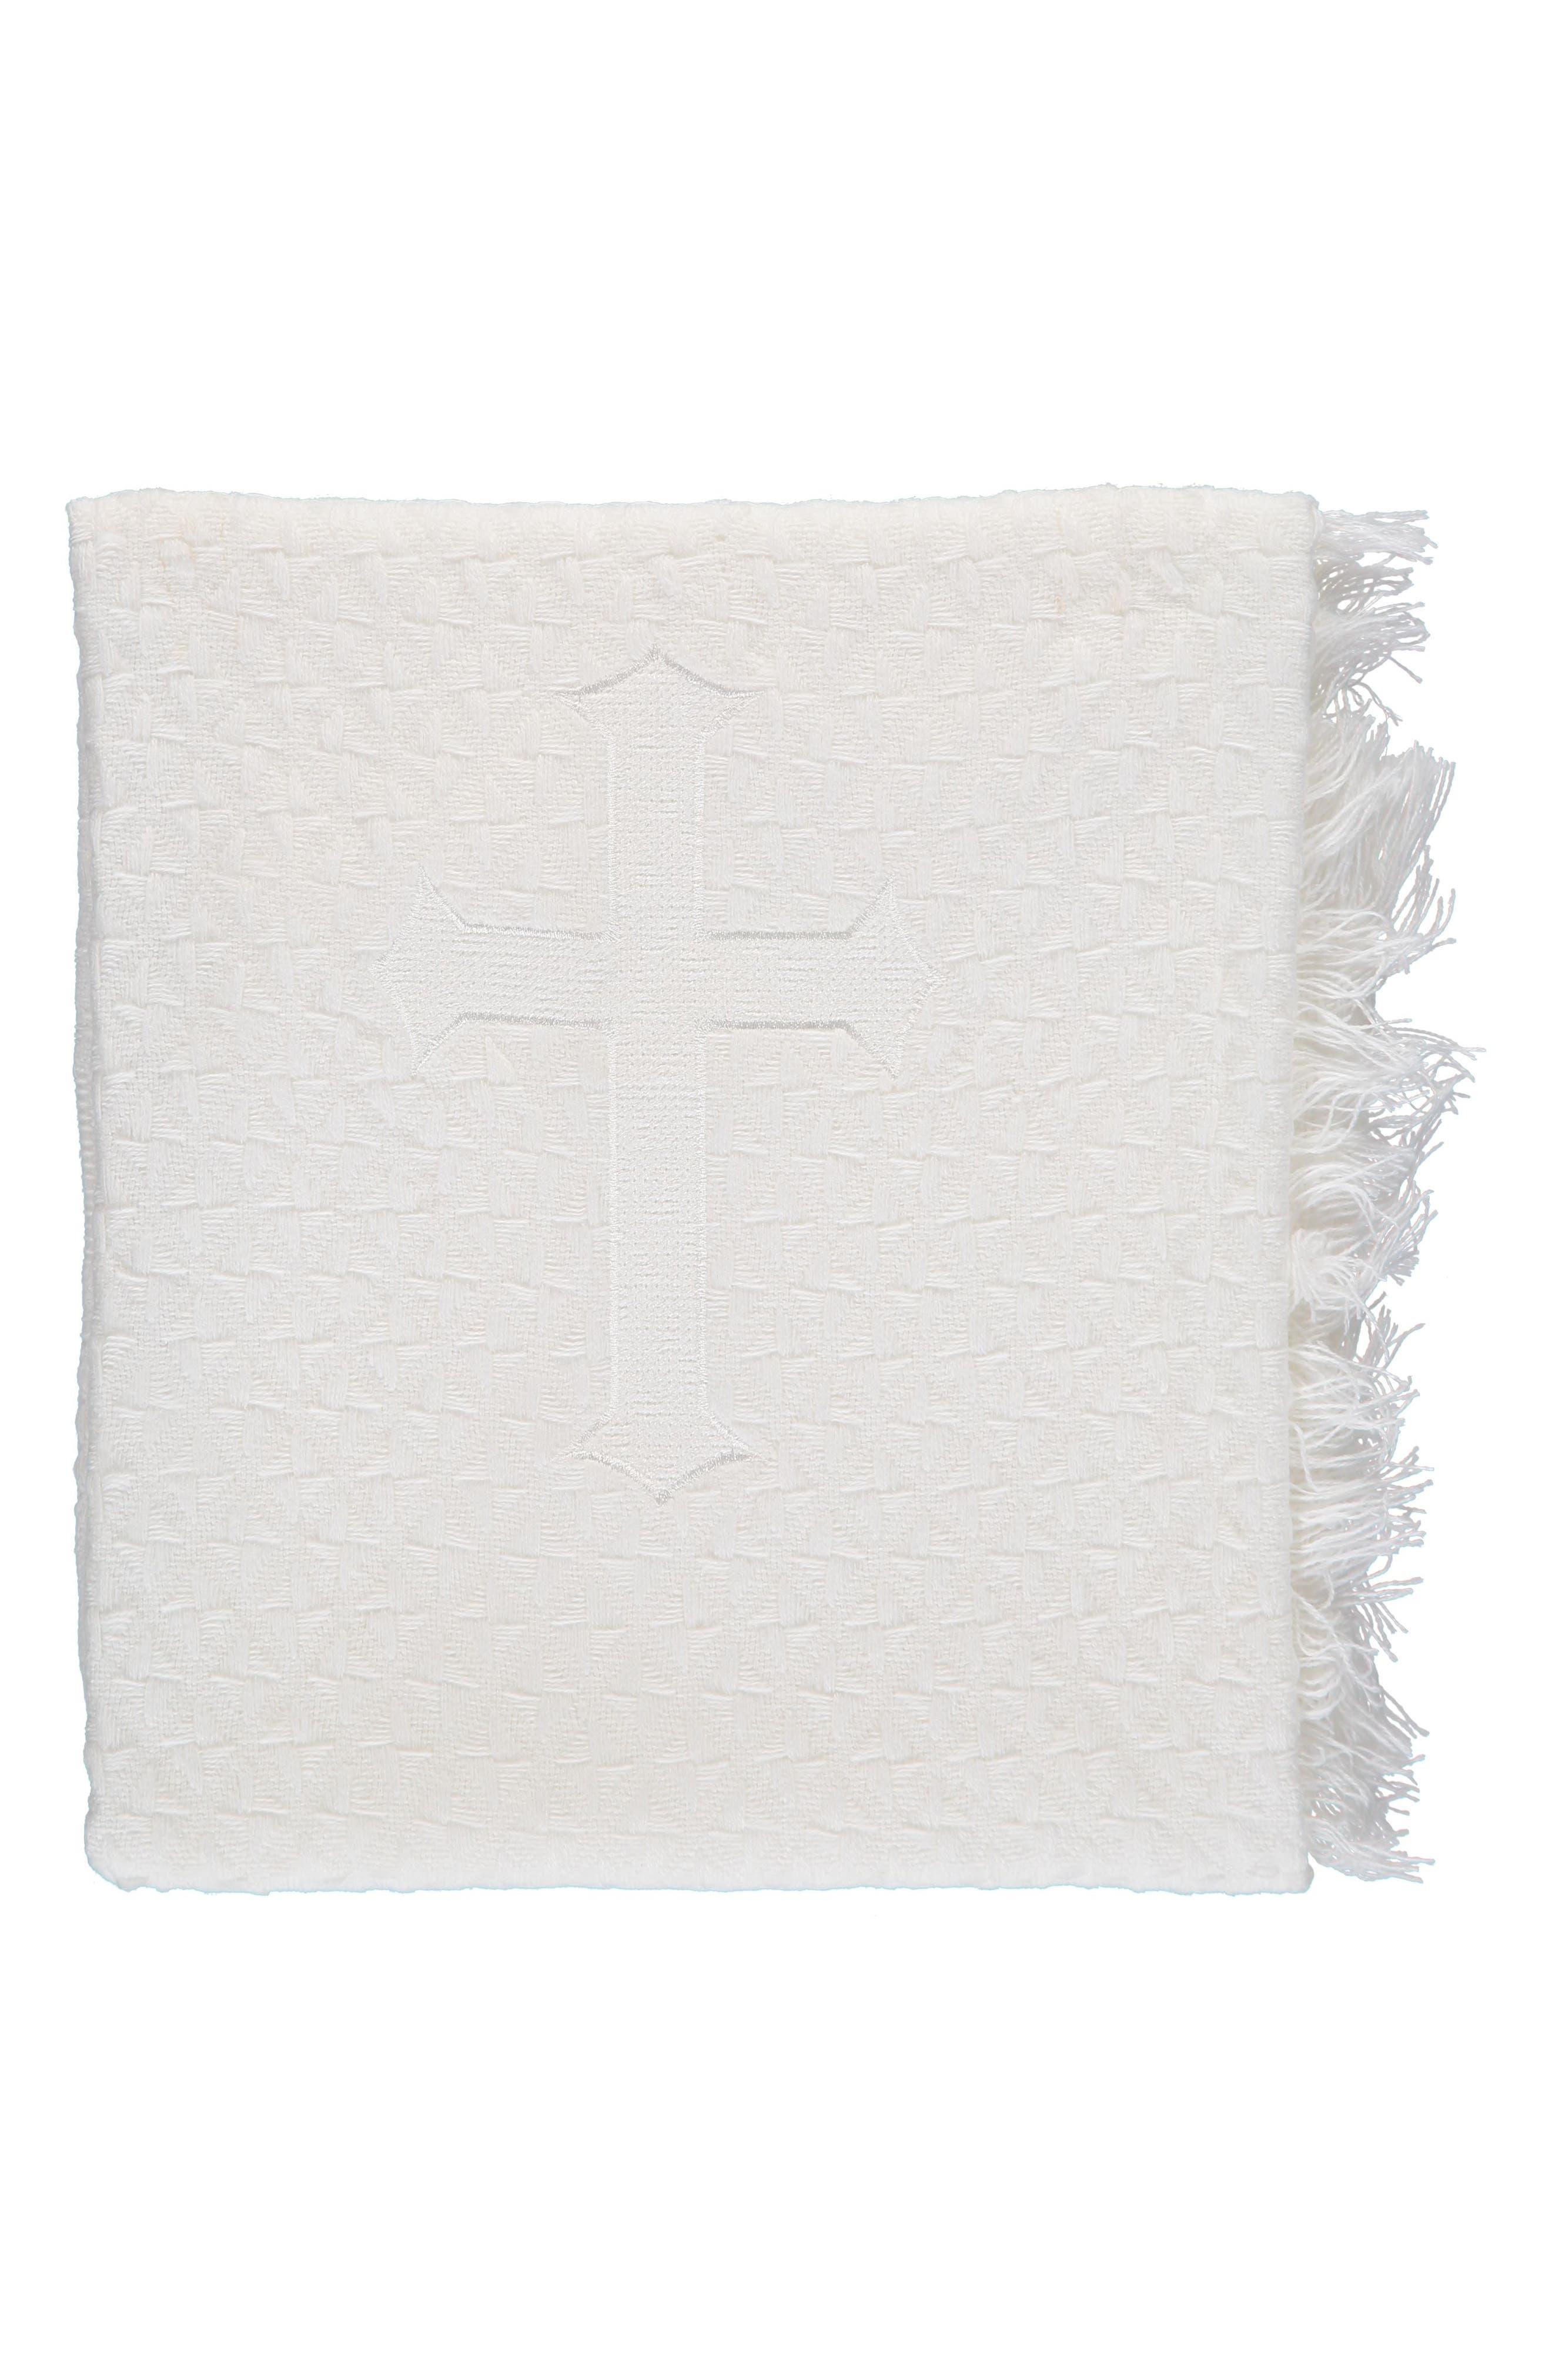 Christening Blanket,                             Main thumbnail 1, color,                             100